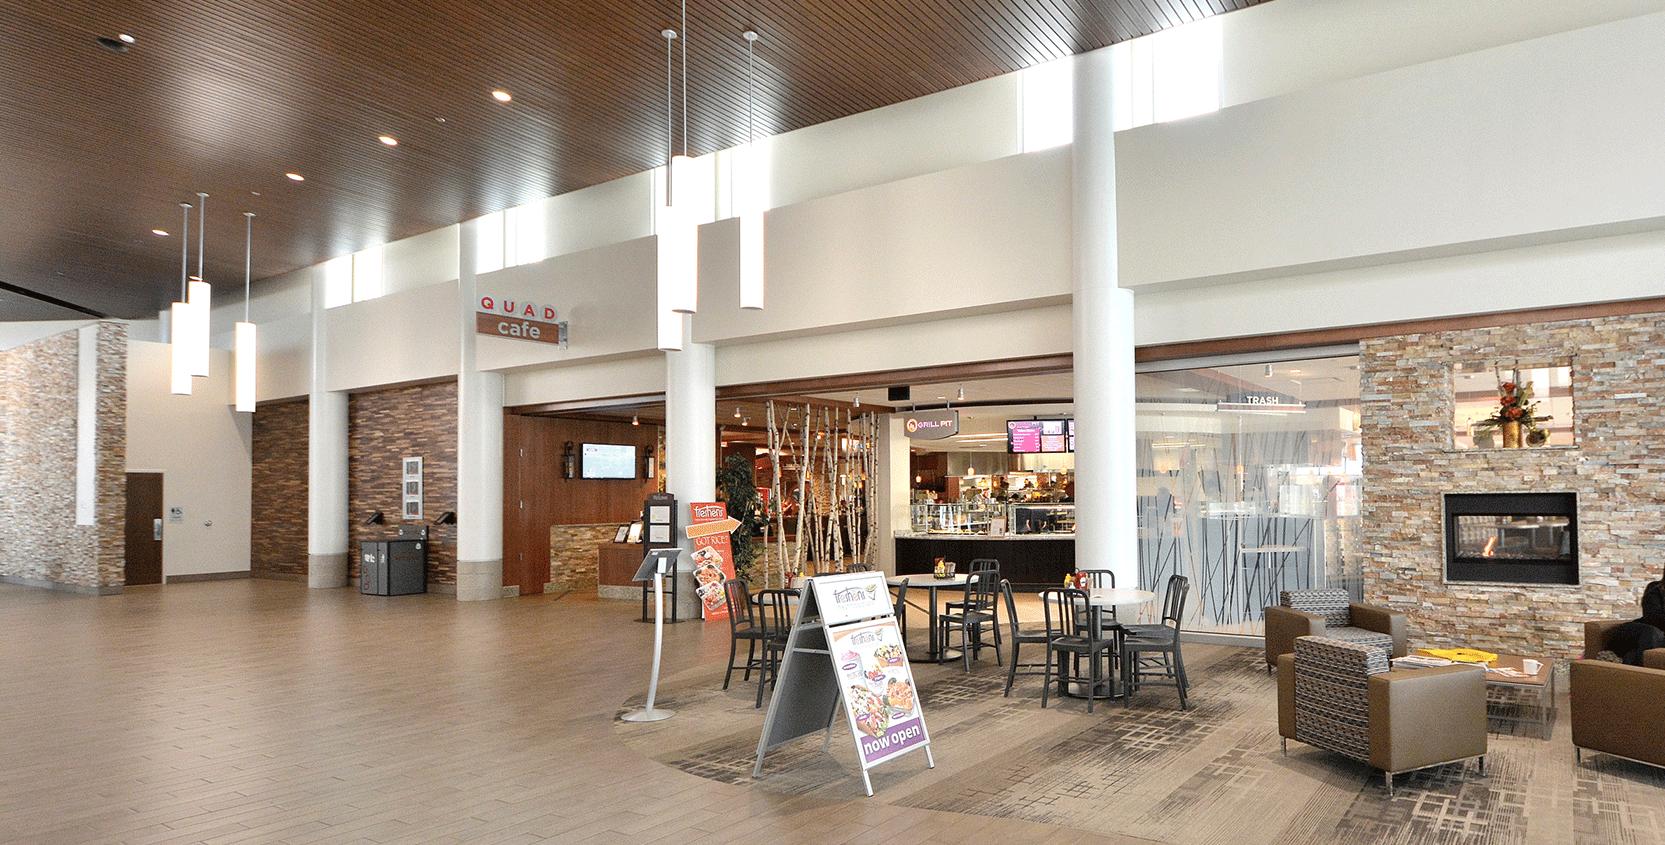 Ferris-State-University-University-Center-Food-Court-Entrance-2-1665x845